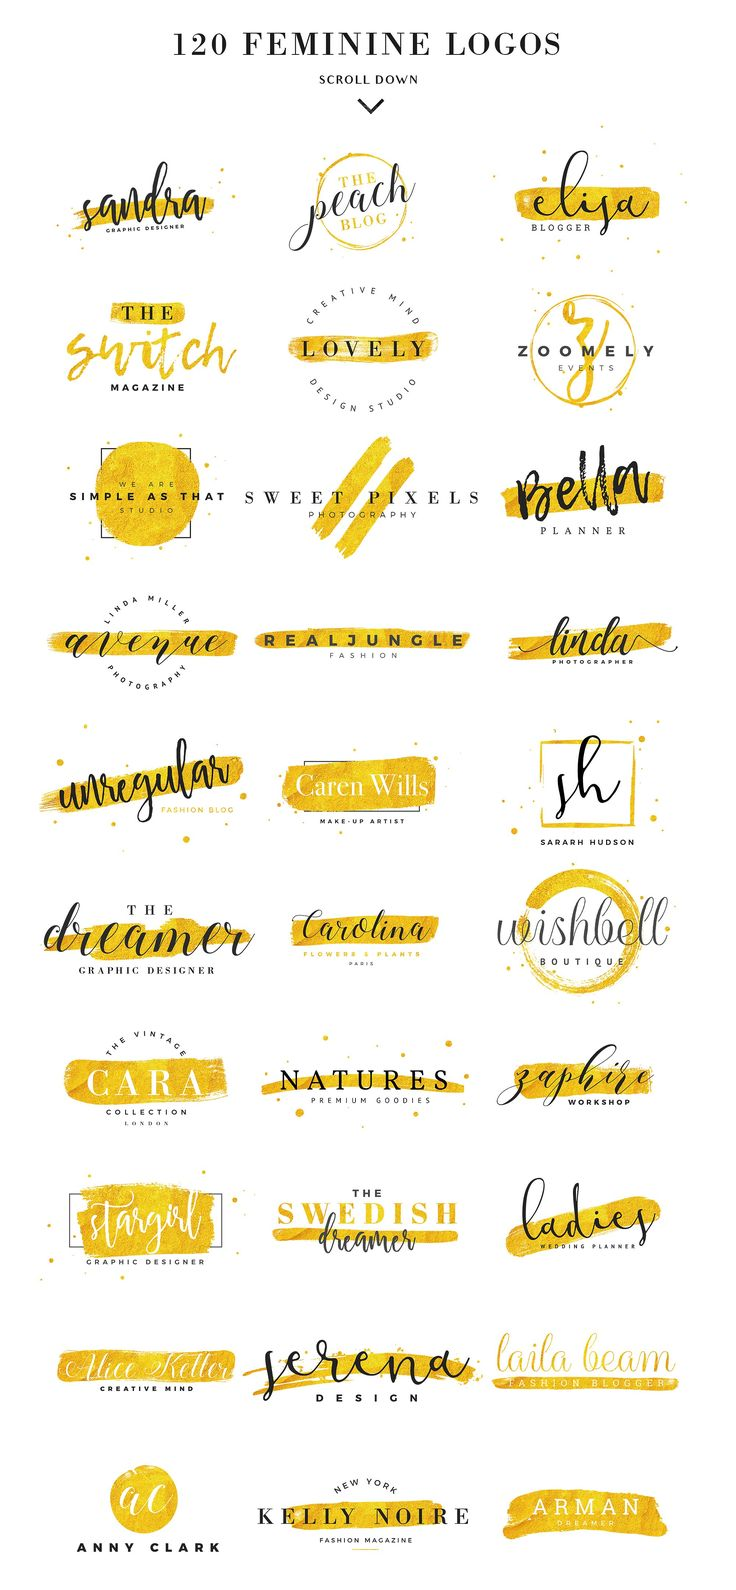 120 Feminine Branding Logos by Davide Bassu on @creativemarket #Branding #logo #Design